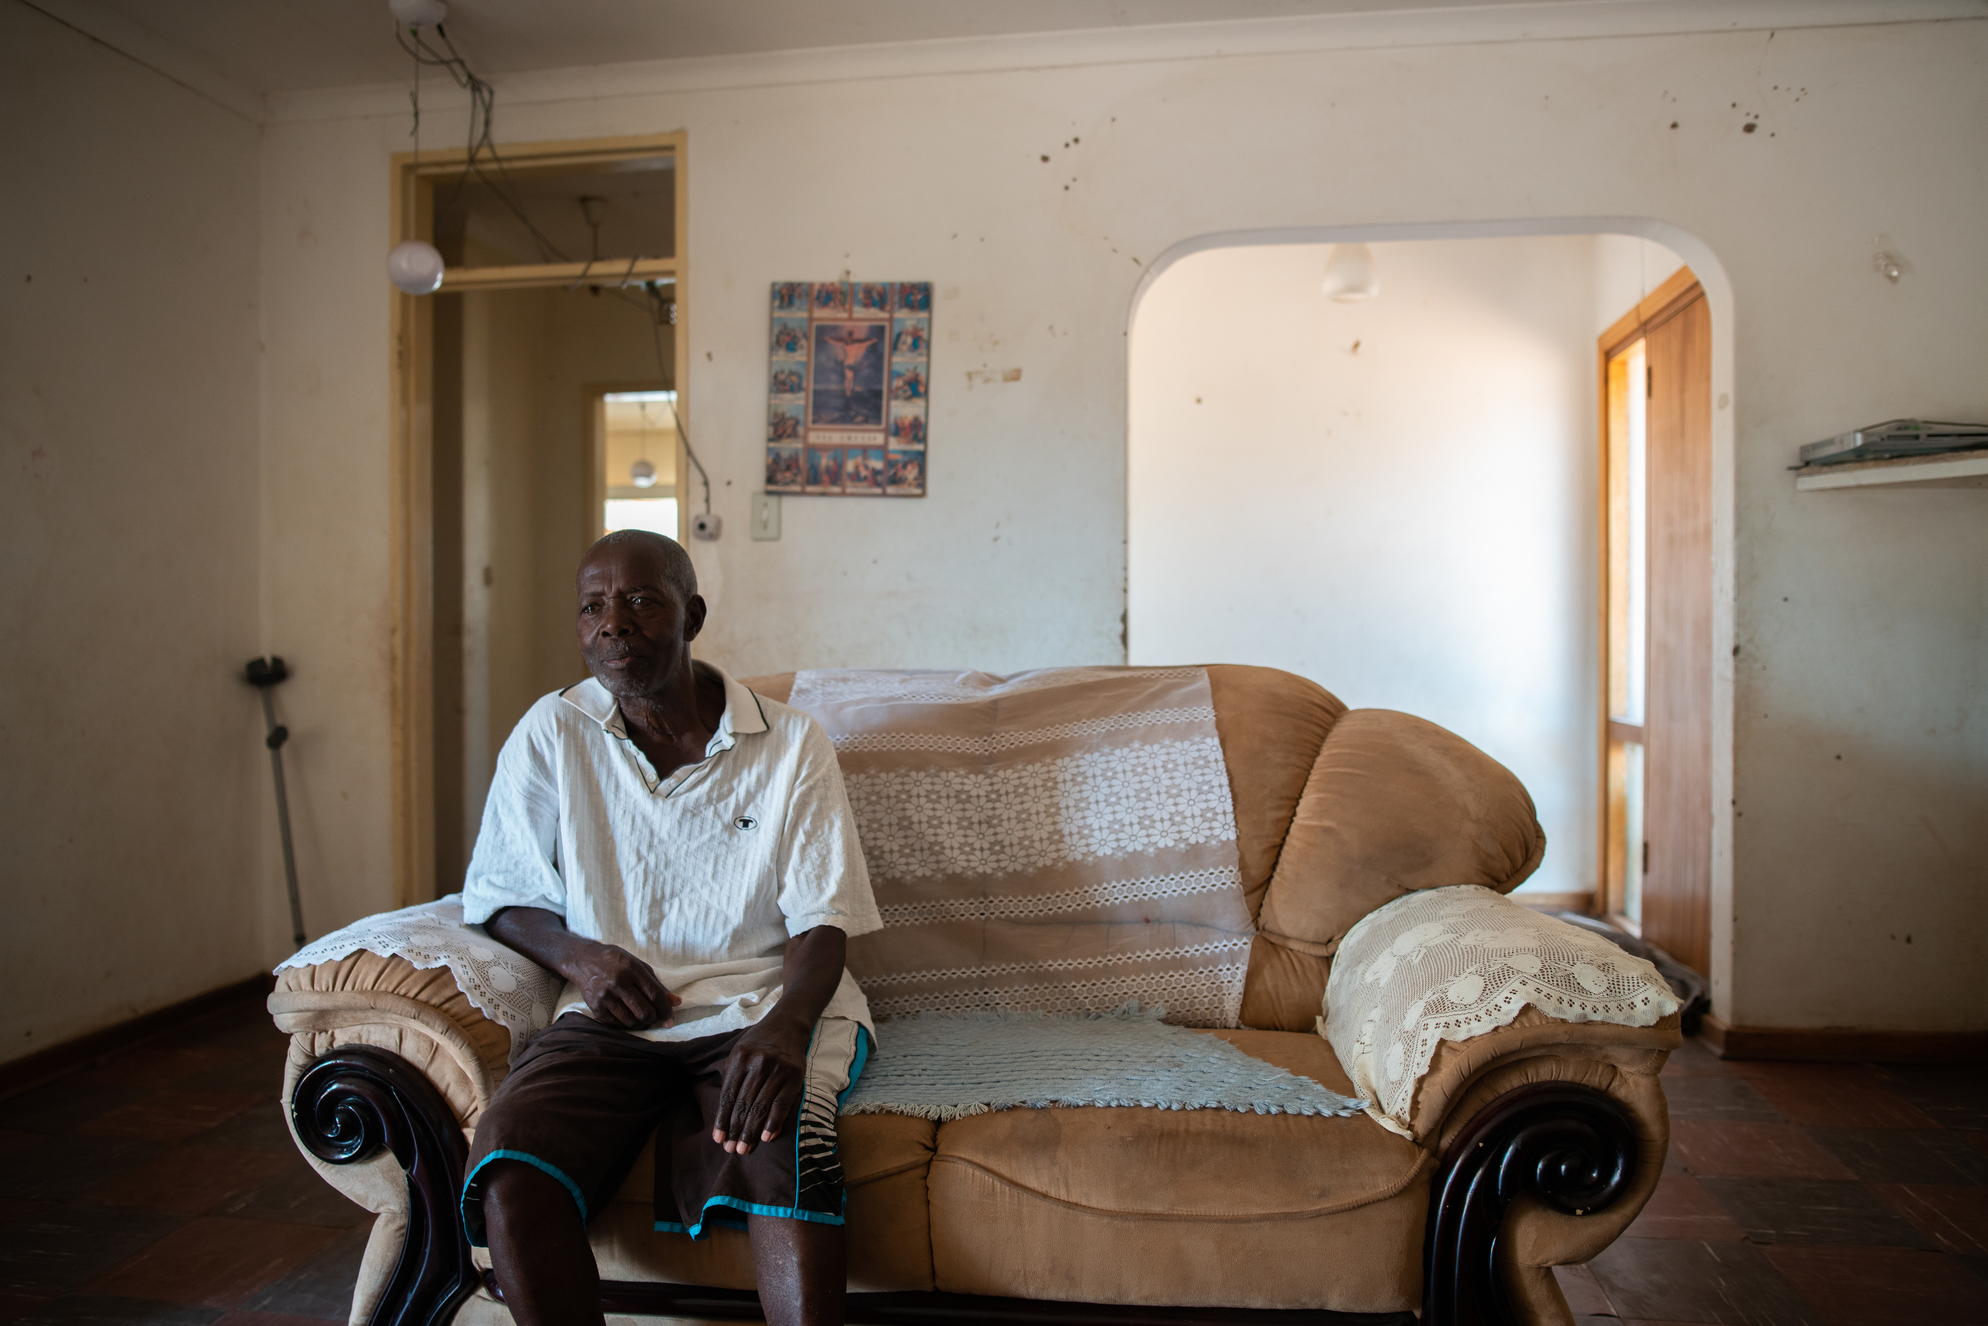 Border War veterans fall through the cracks of reconciliation | GroundUp